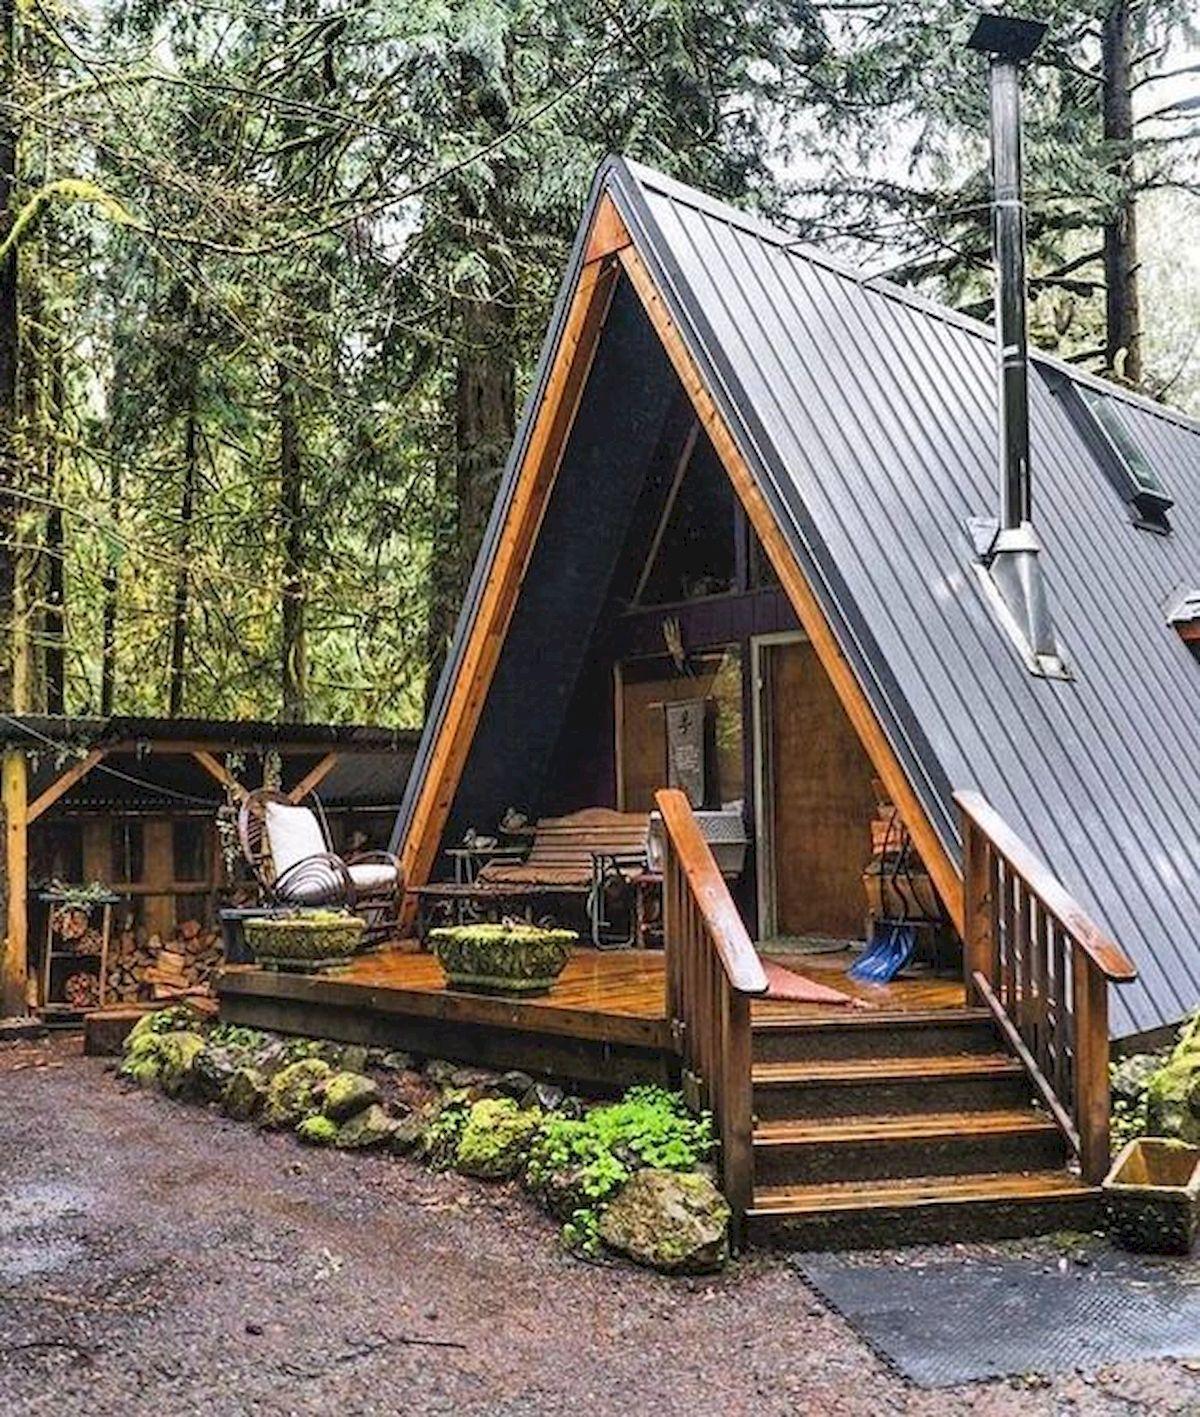 Awesome 70 Suprising Small Log Cabin Homes Design Ideas Https Livingmarch Com 70 Suprising Small Log Ca Building A Tiny House Small Log Cabin Log Cabin Homes